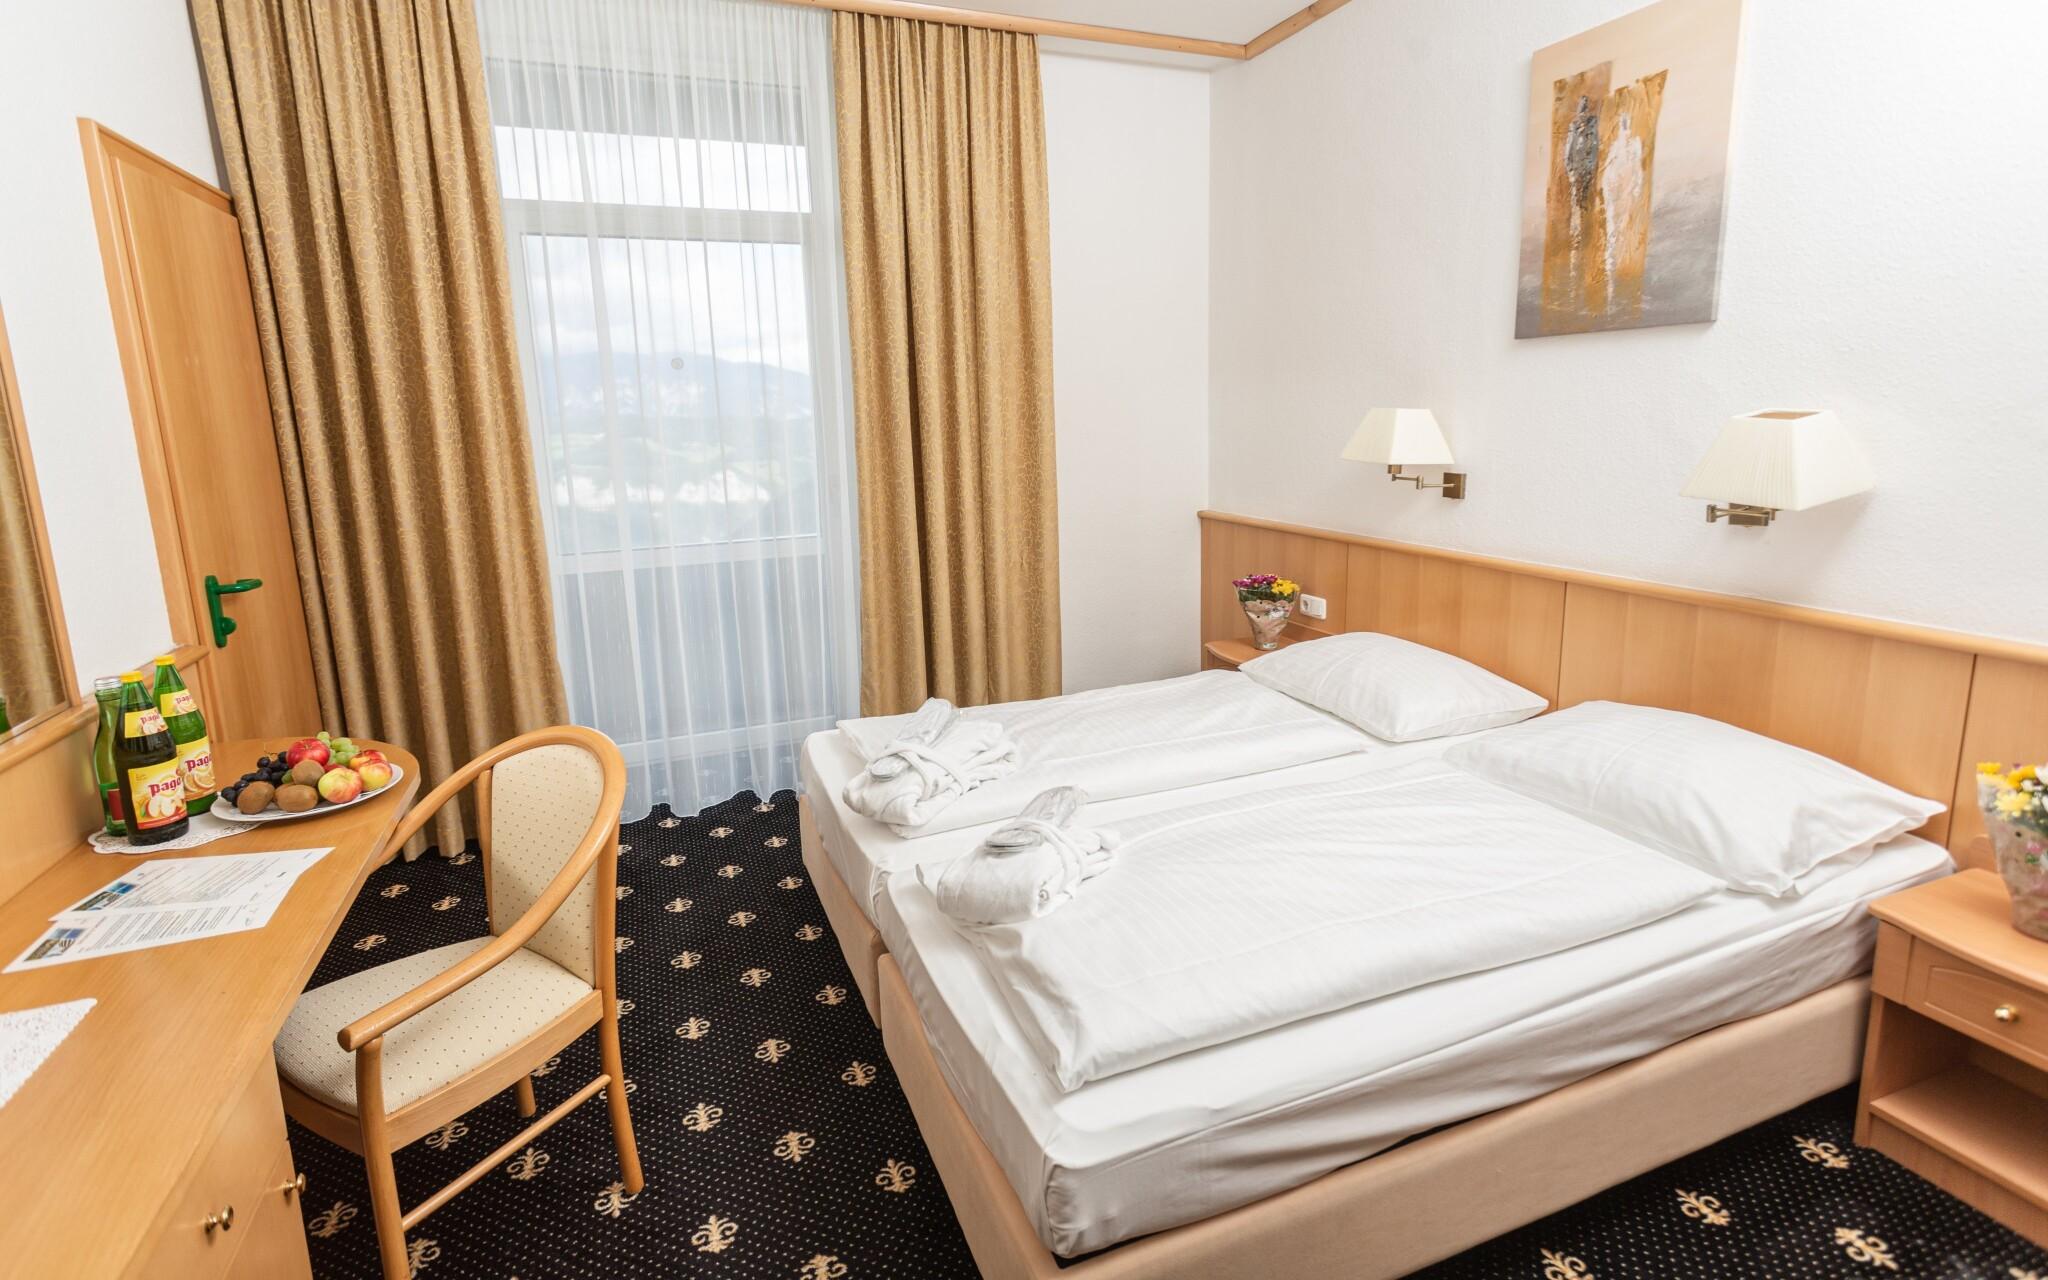 Izba Standard, Sporthotel am Semmering ***, Rakúsko